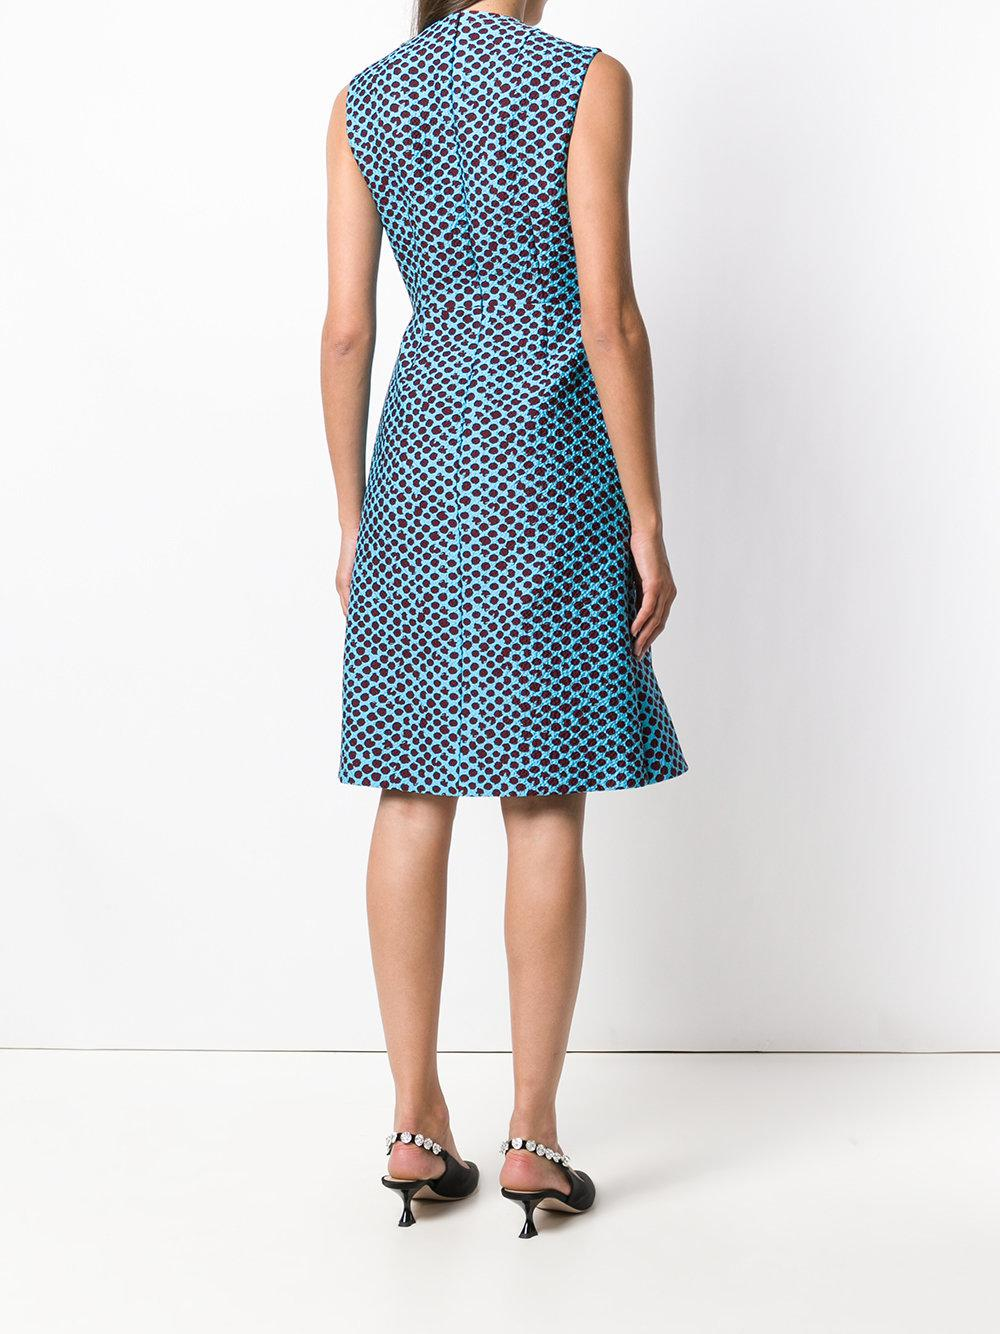 Delpozo Silk Textured Print Sundress in Blue